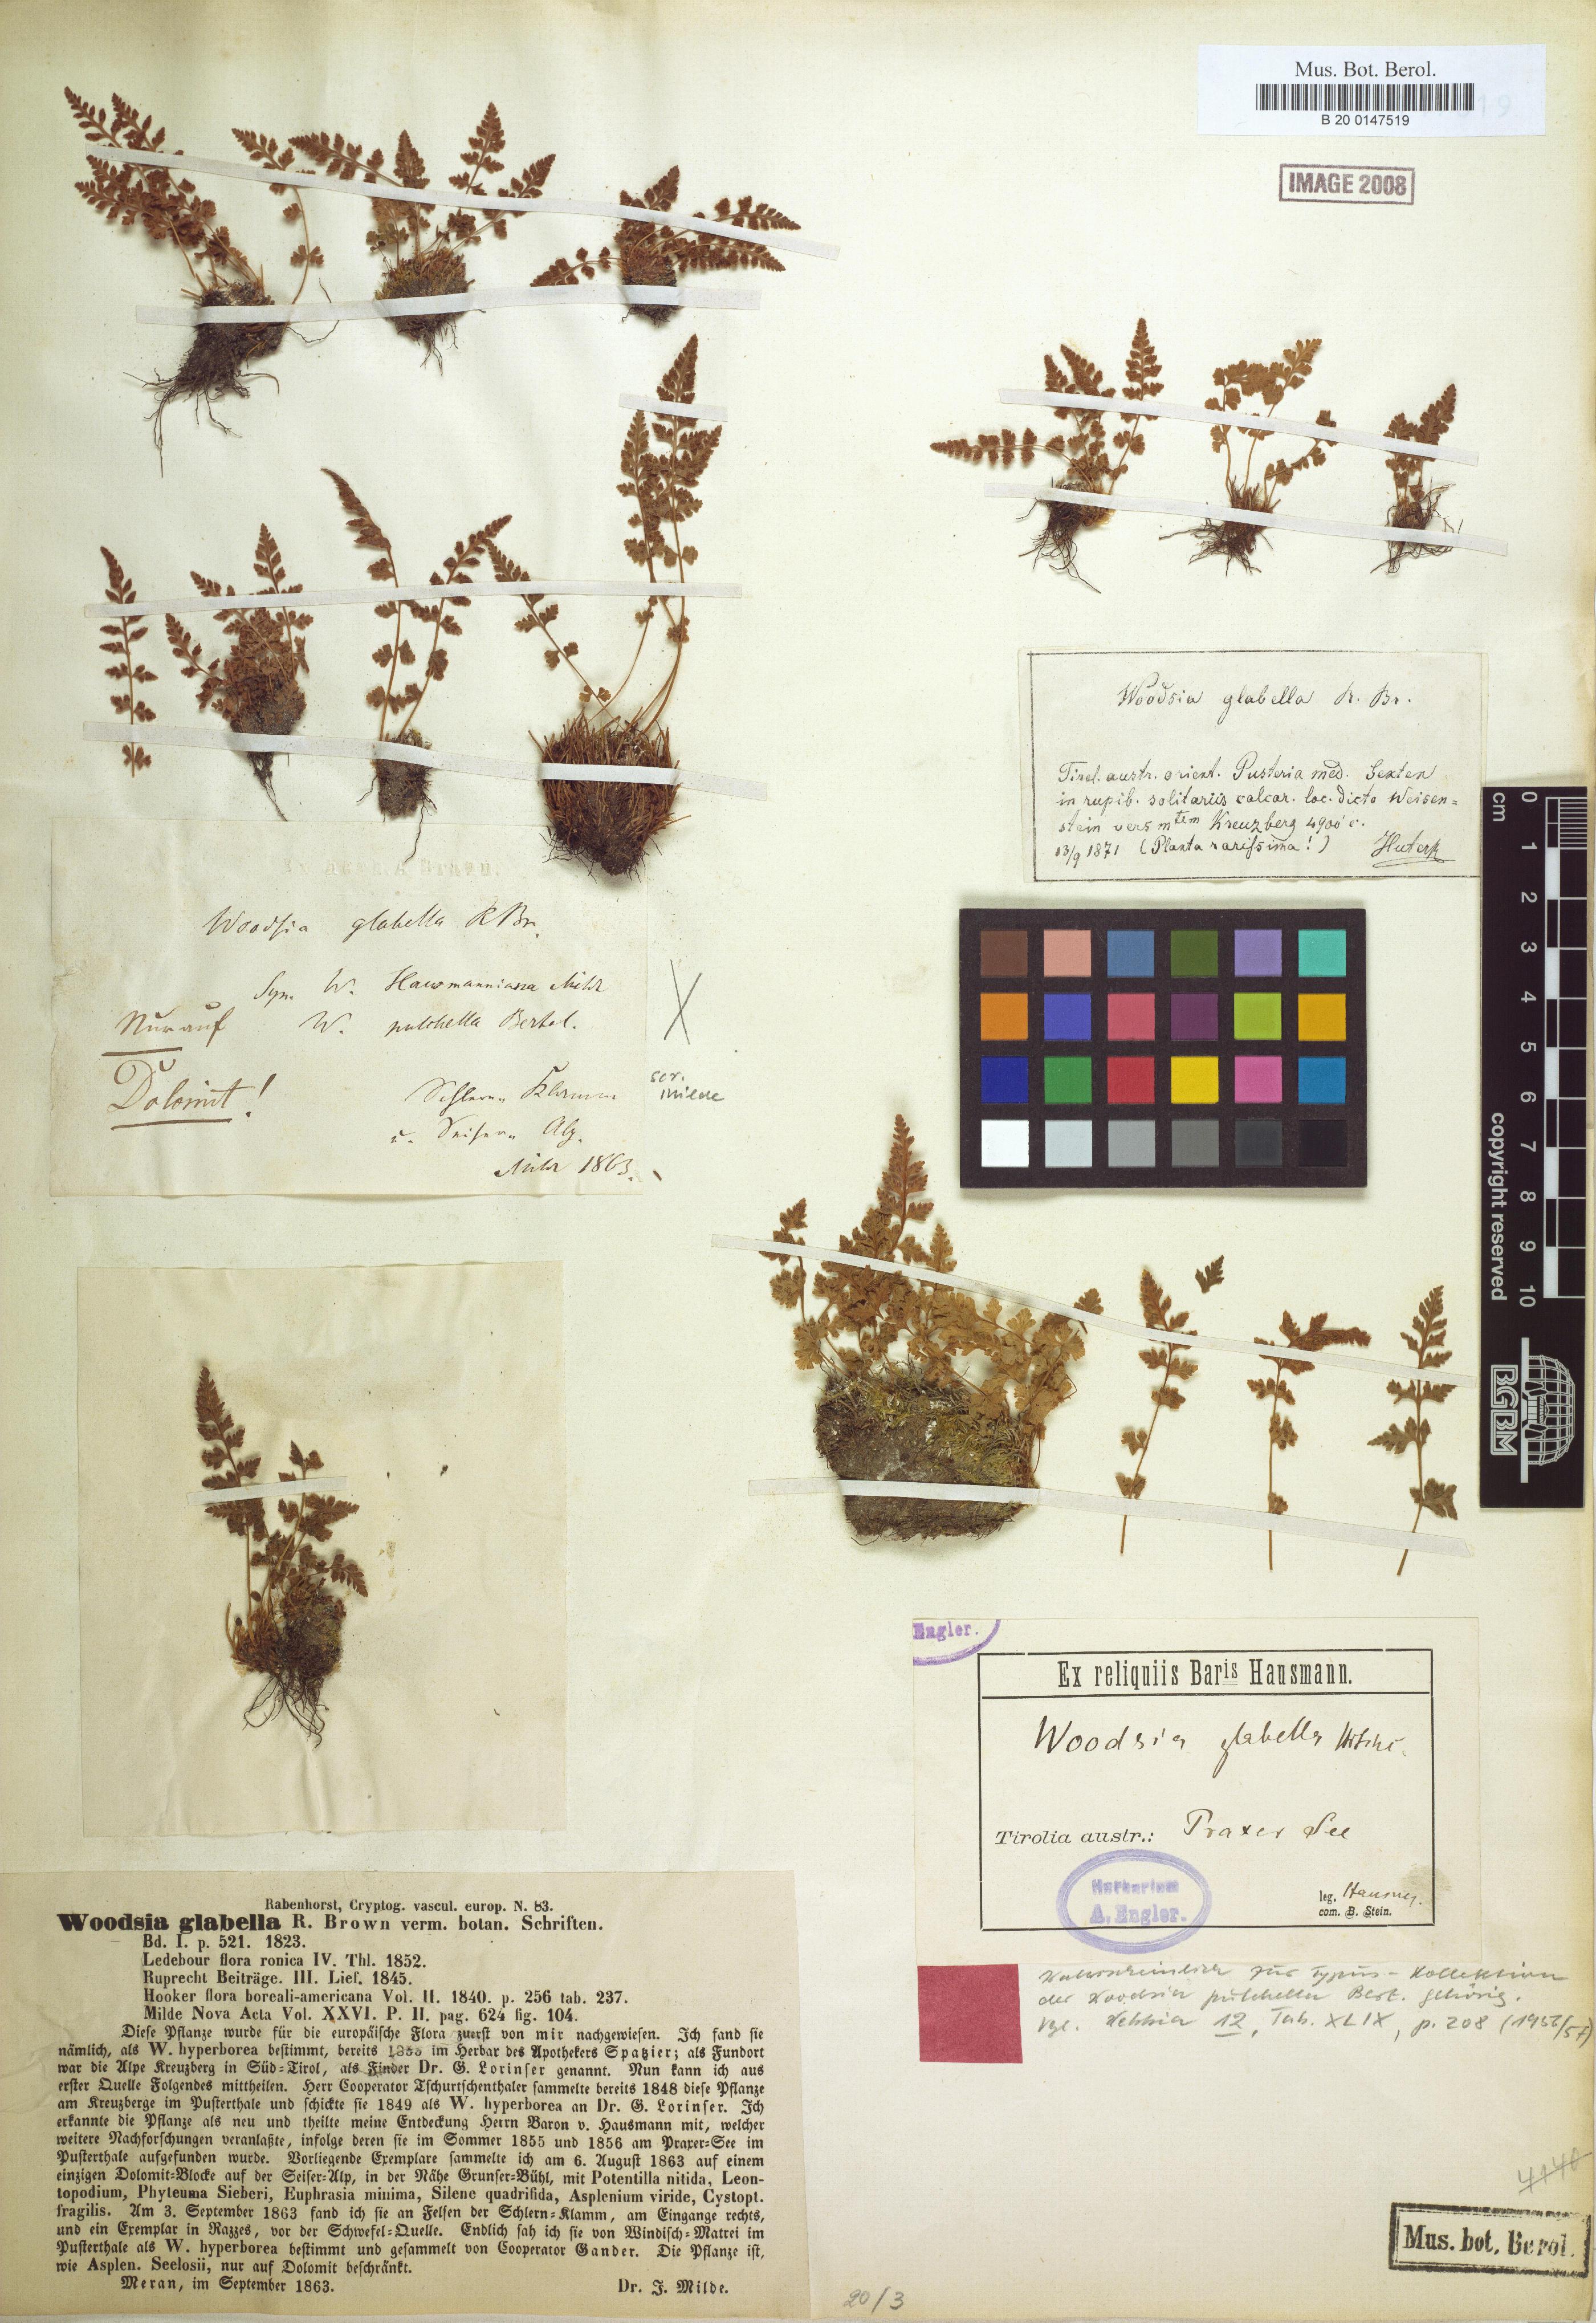 © Botanic Garden and Botanical Museum Berlin-Dahlem, Freie Universität Berlin - image of Androsace elongata s.l.<br>by  Röpert, D. (Ed.) 2000- (continuously updated): Digital specimen images at the Herbarium Berolinense. - Published on the Internet http://ww2.bgbm.org/herbarium/ (Barcode: B 20 0147519 a / ImageId: 275944) [accessed 29-Nov-11].<br>